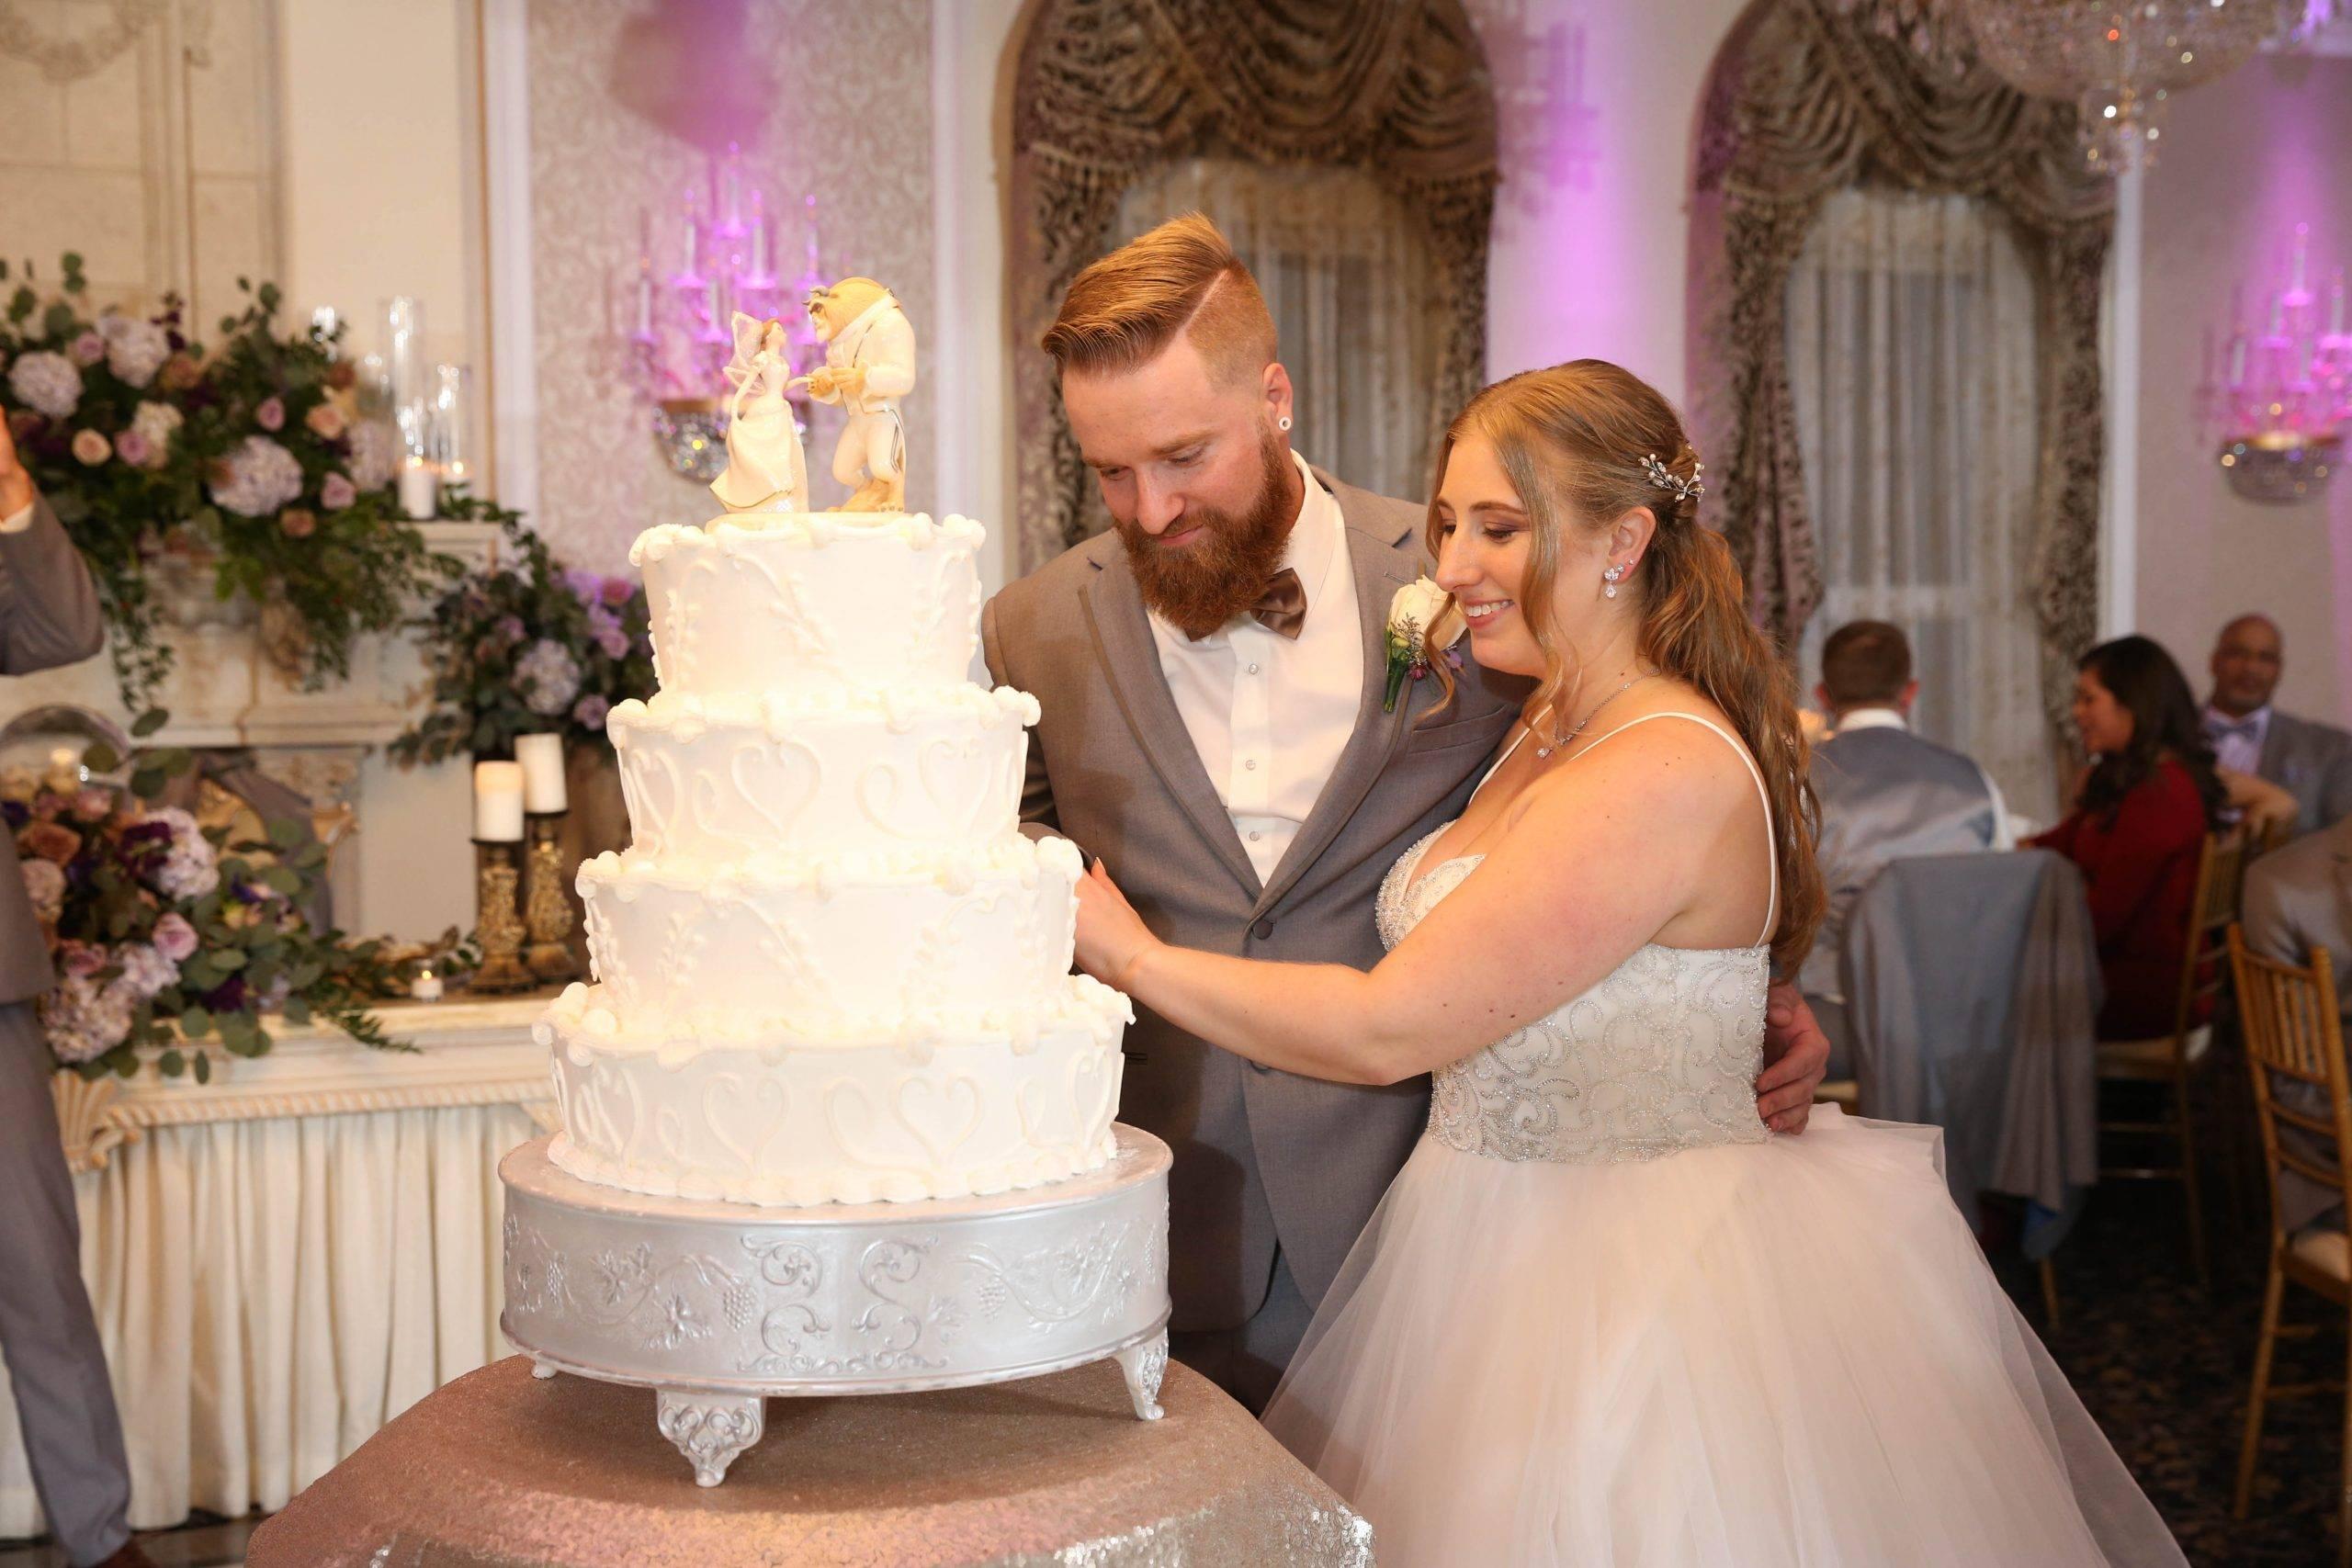 Primavera Regency bride and groom cut the cake